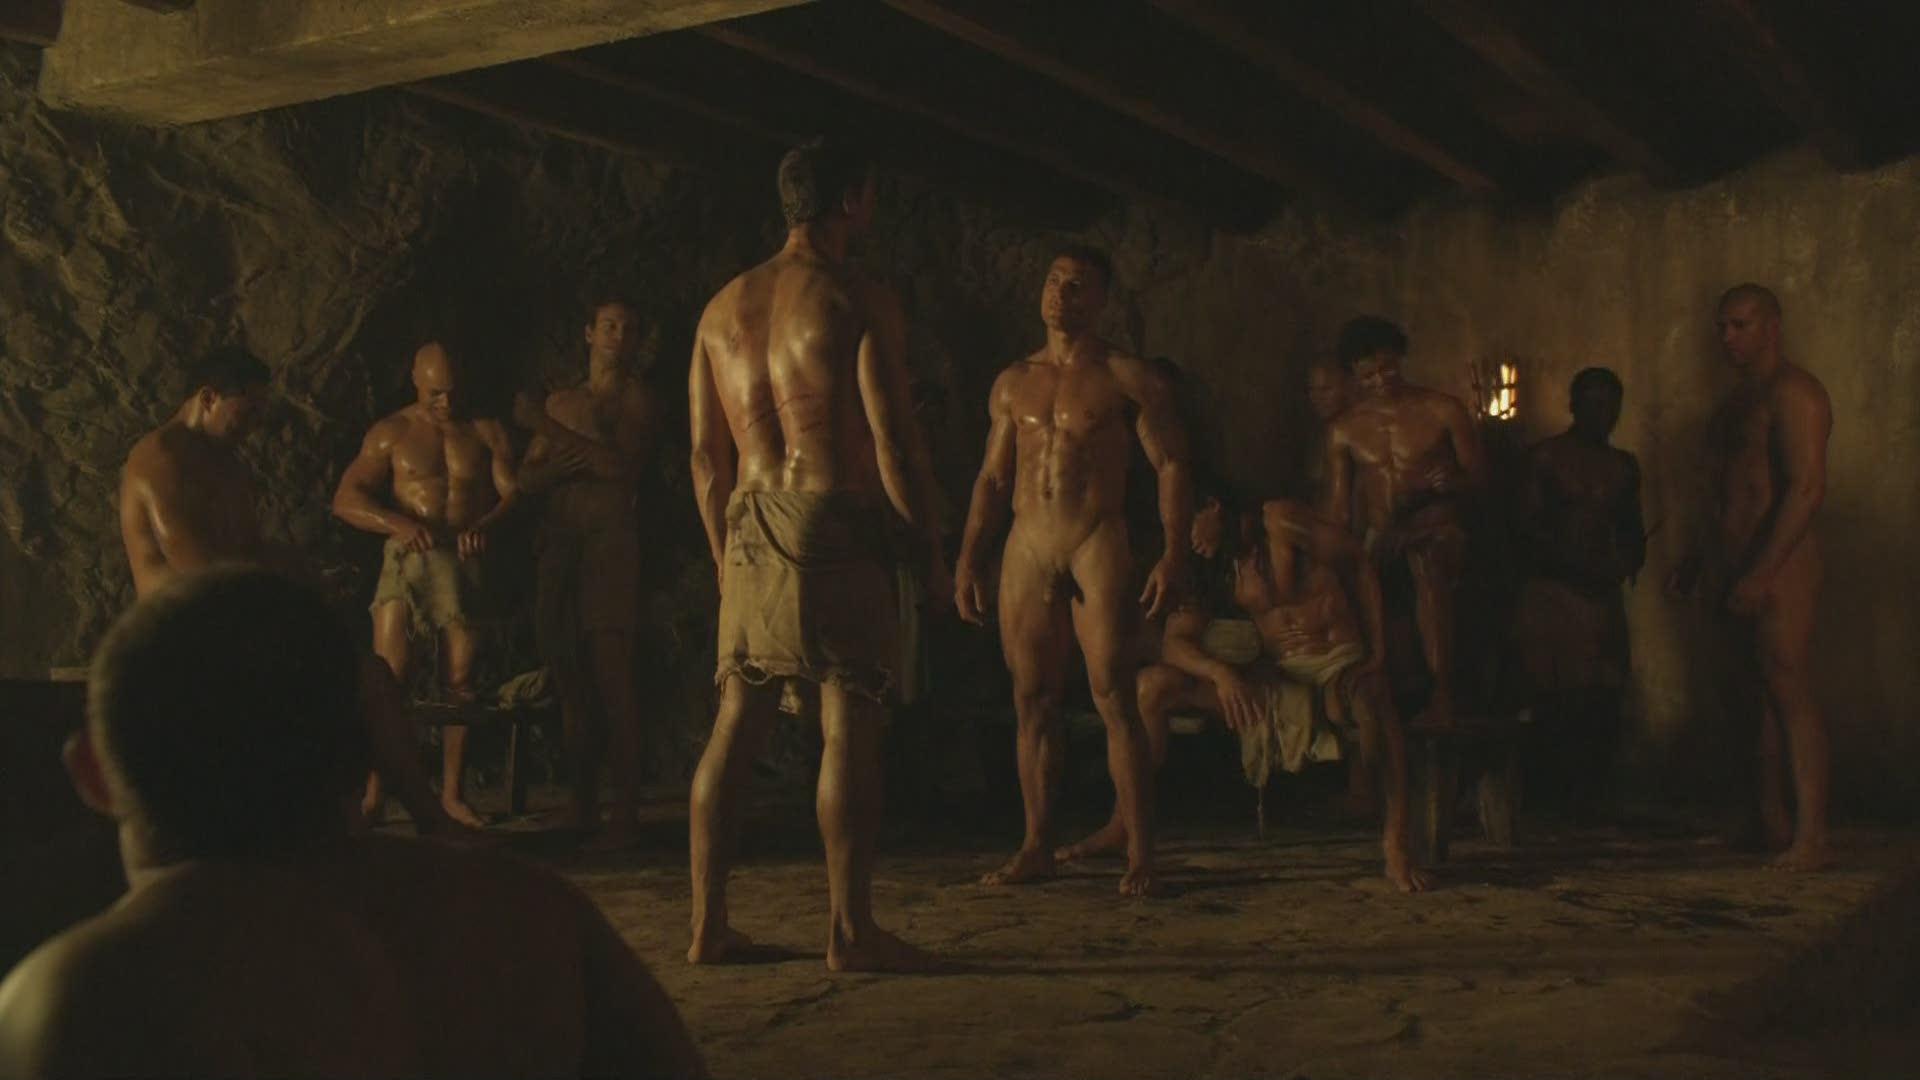 Manu nude fuck wallpaper erotic women